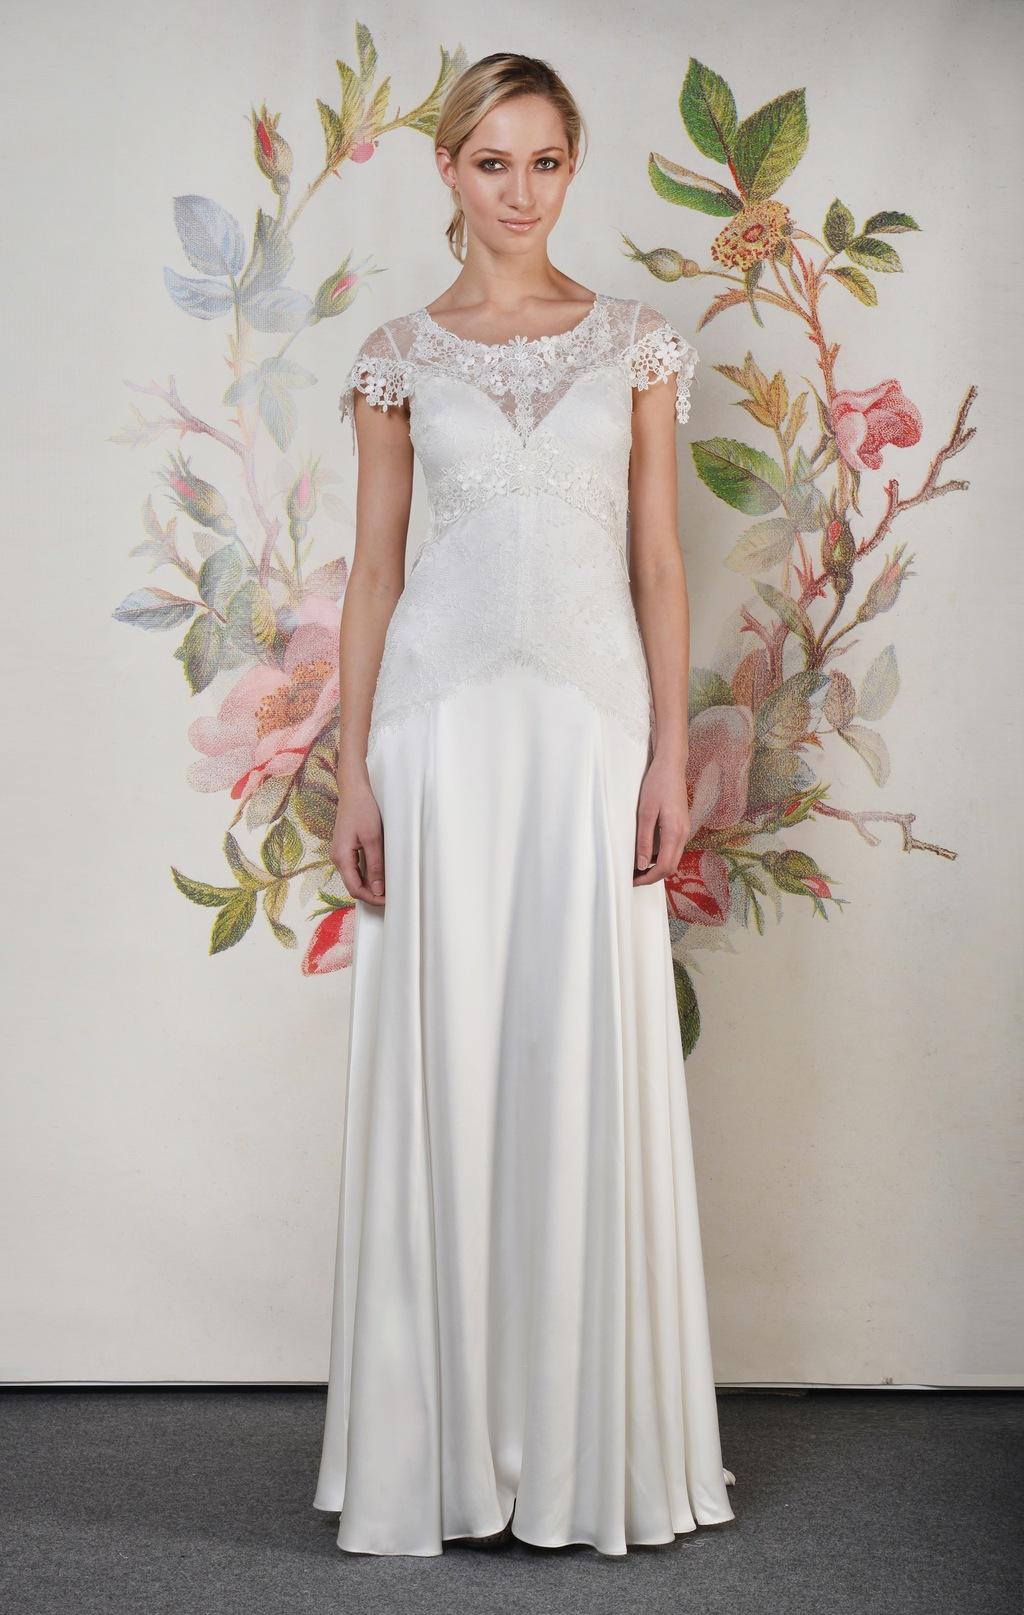 Claire-pettibone-spring-summer-2014-wedding-dress-wren_f_01.full